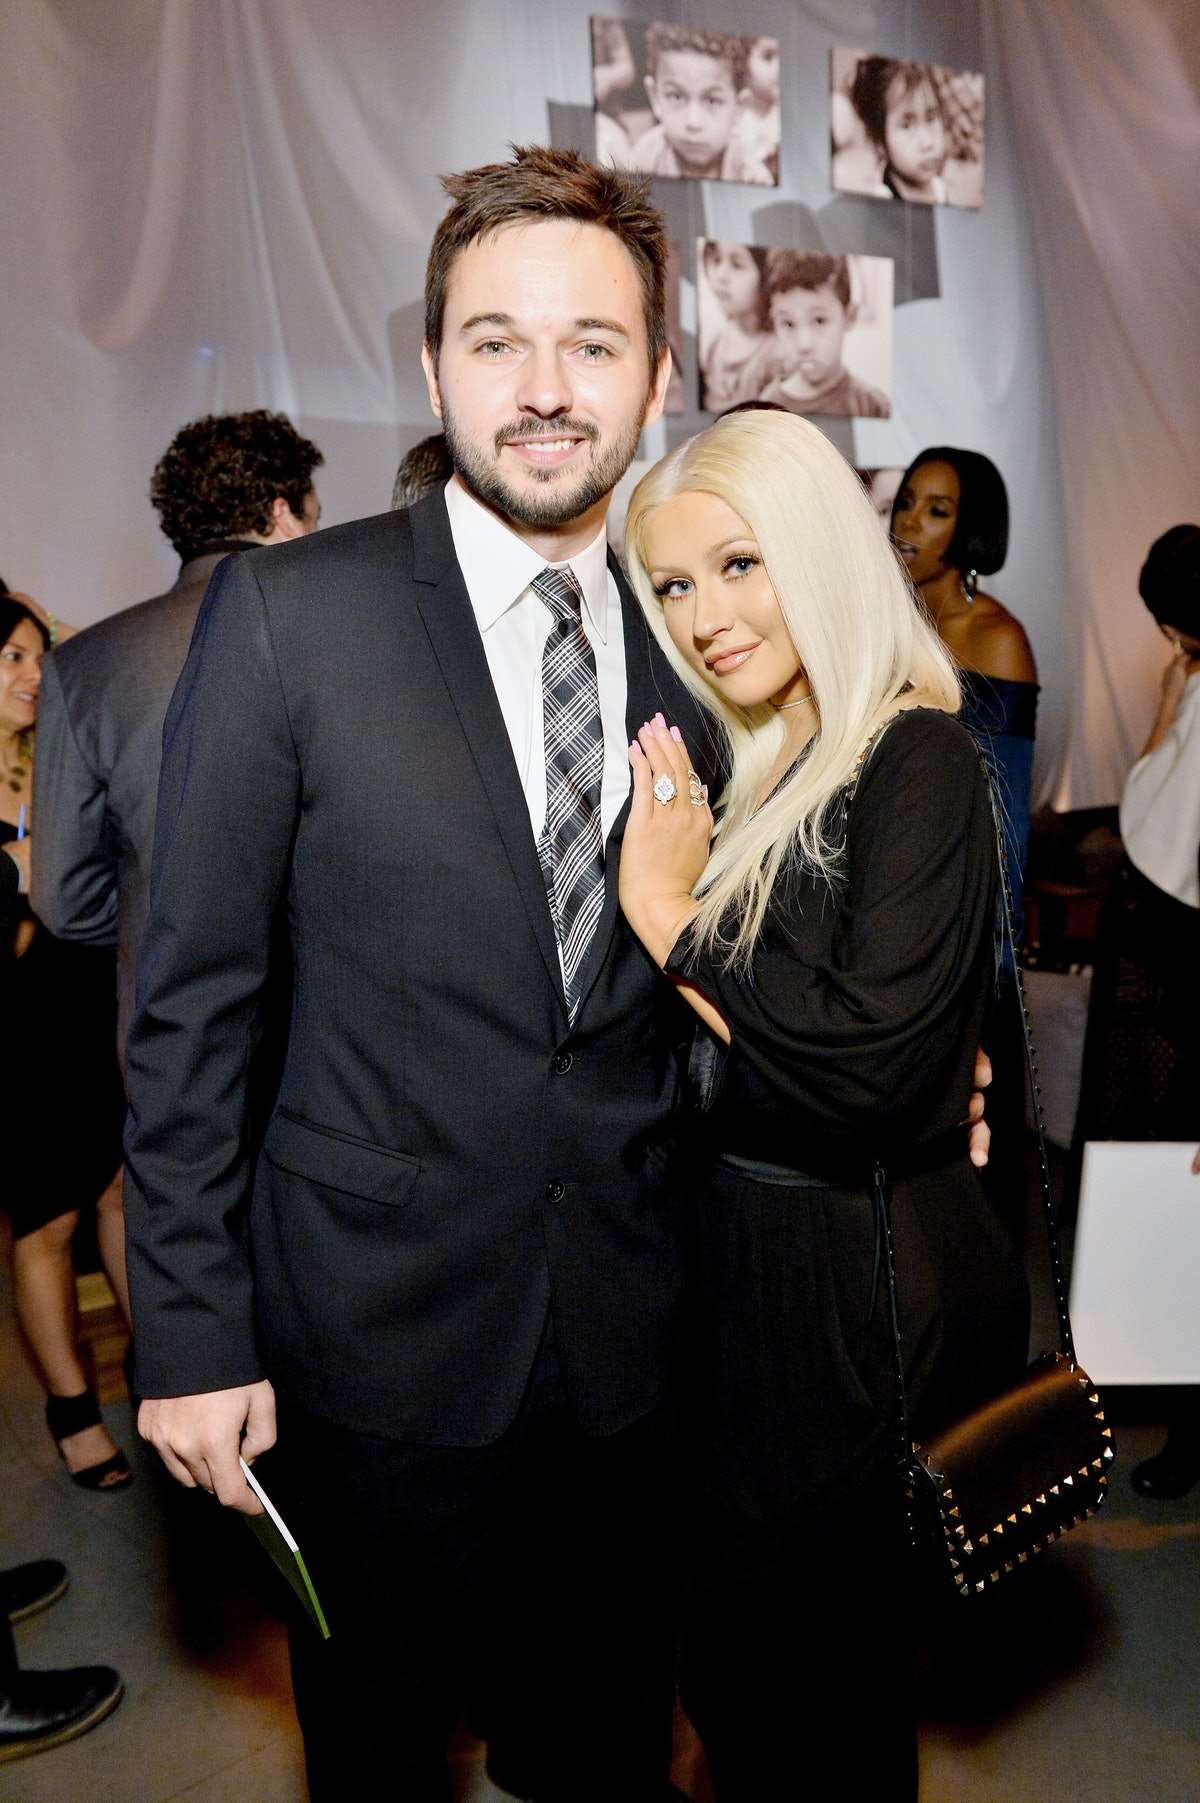 CULVER CITY, CA - NOVEMBER 12: Matthew Rutler (L) and recording artist Christina Aguilera attend the...